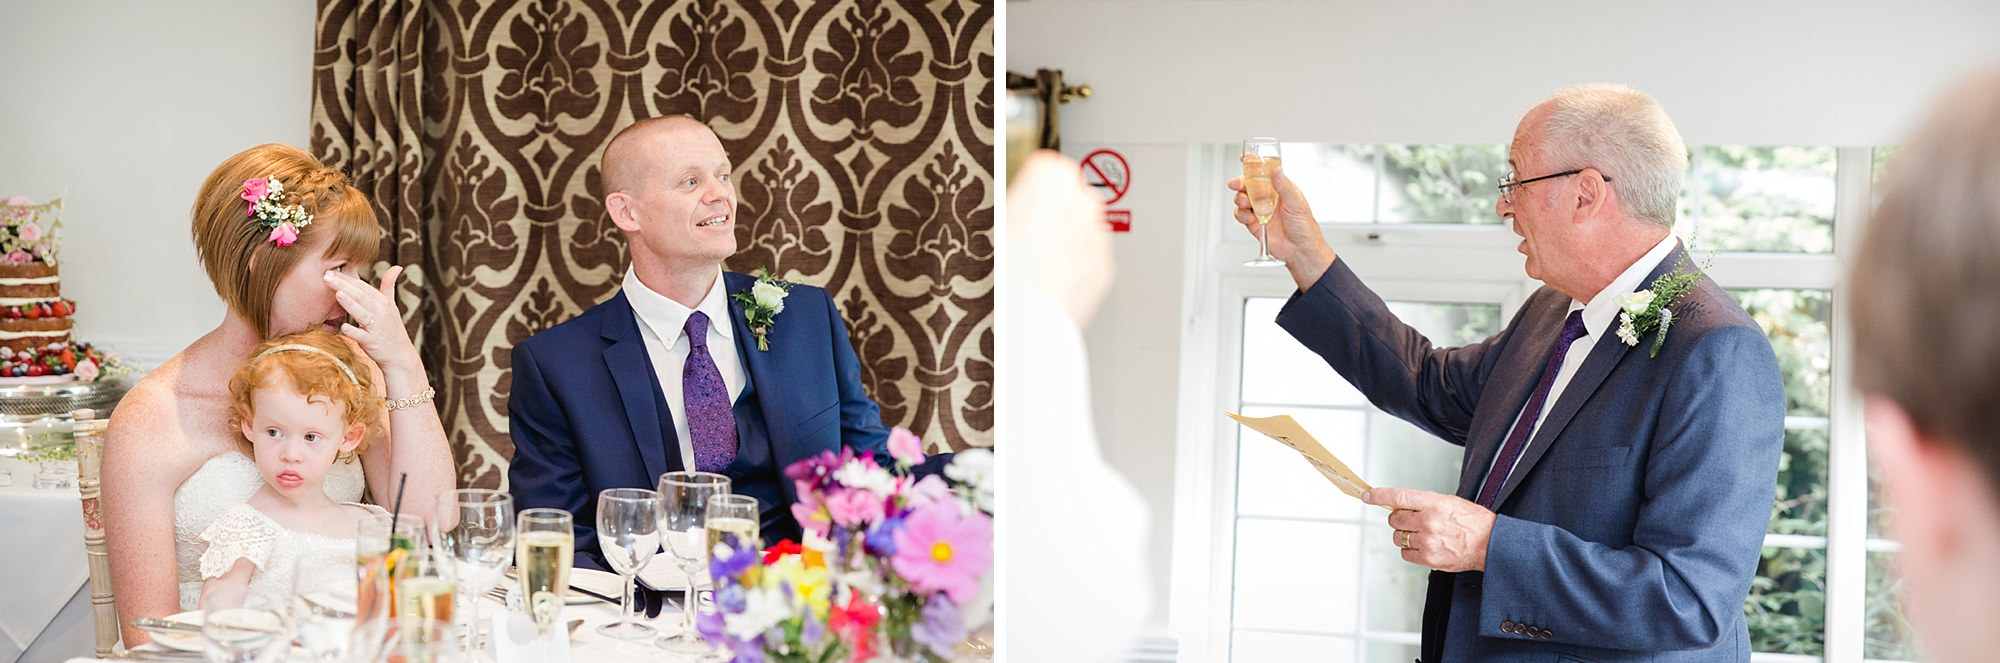 Mill House hotel wedding photography wedding toast